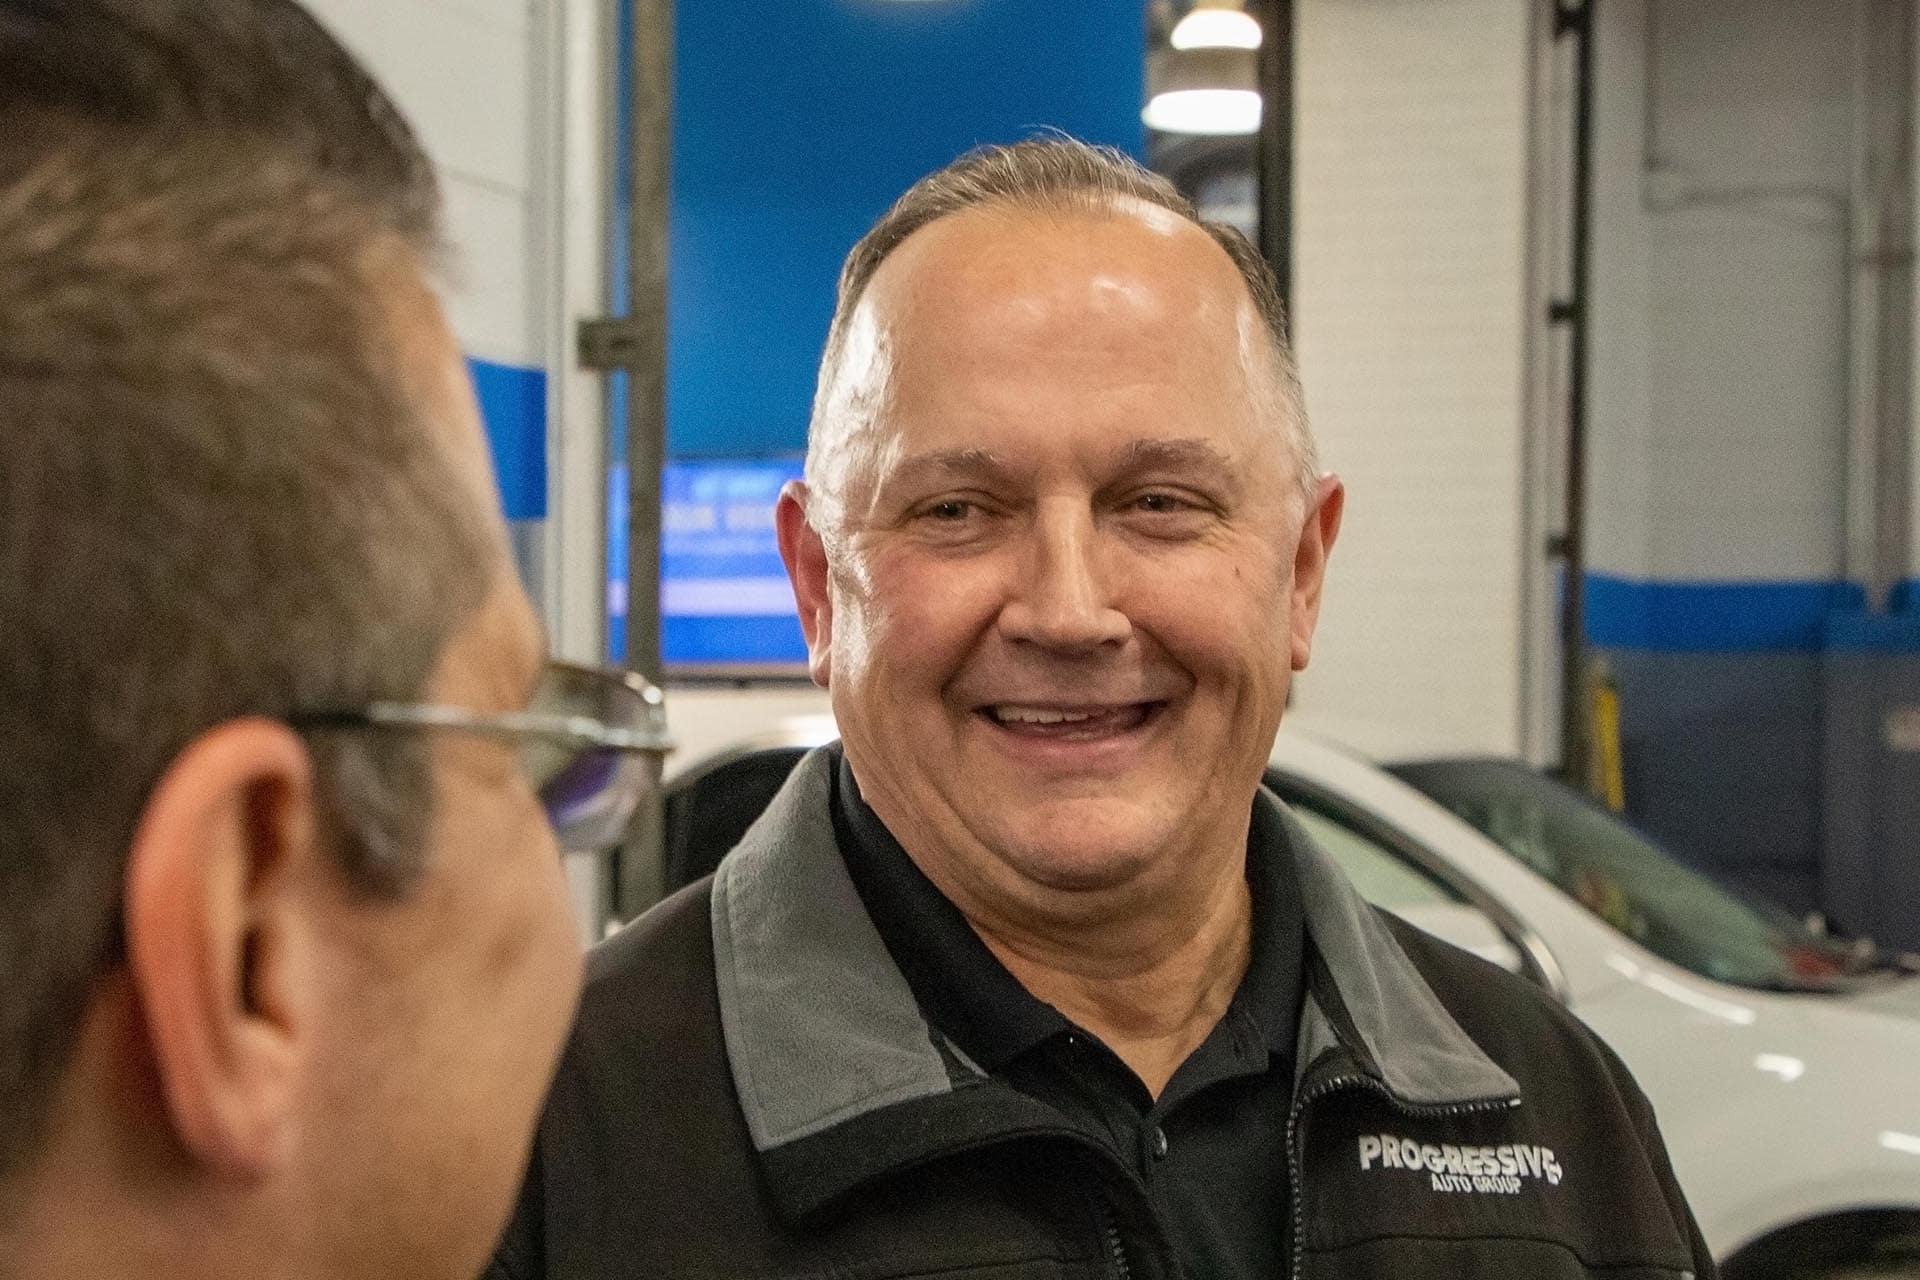 Progressive Chevrolet Service Manager John Gaddis